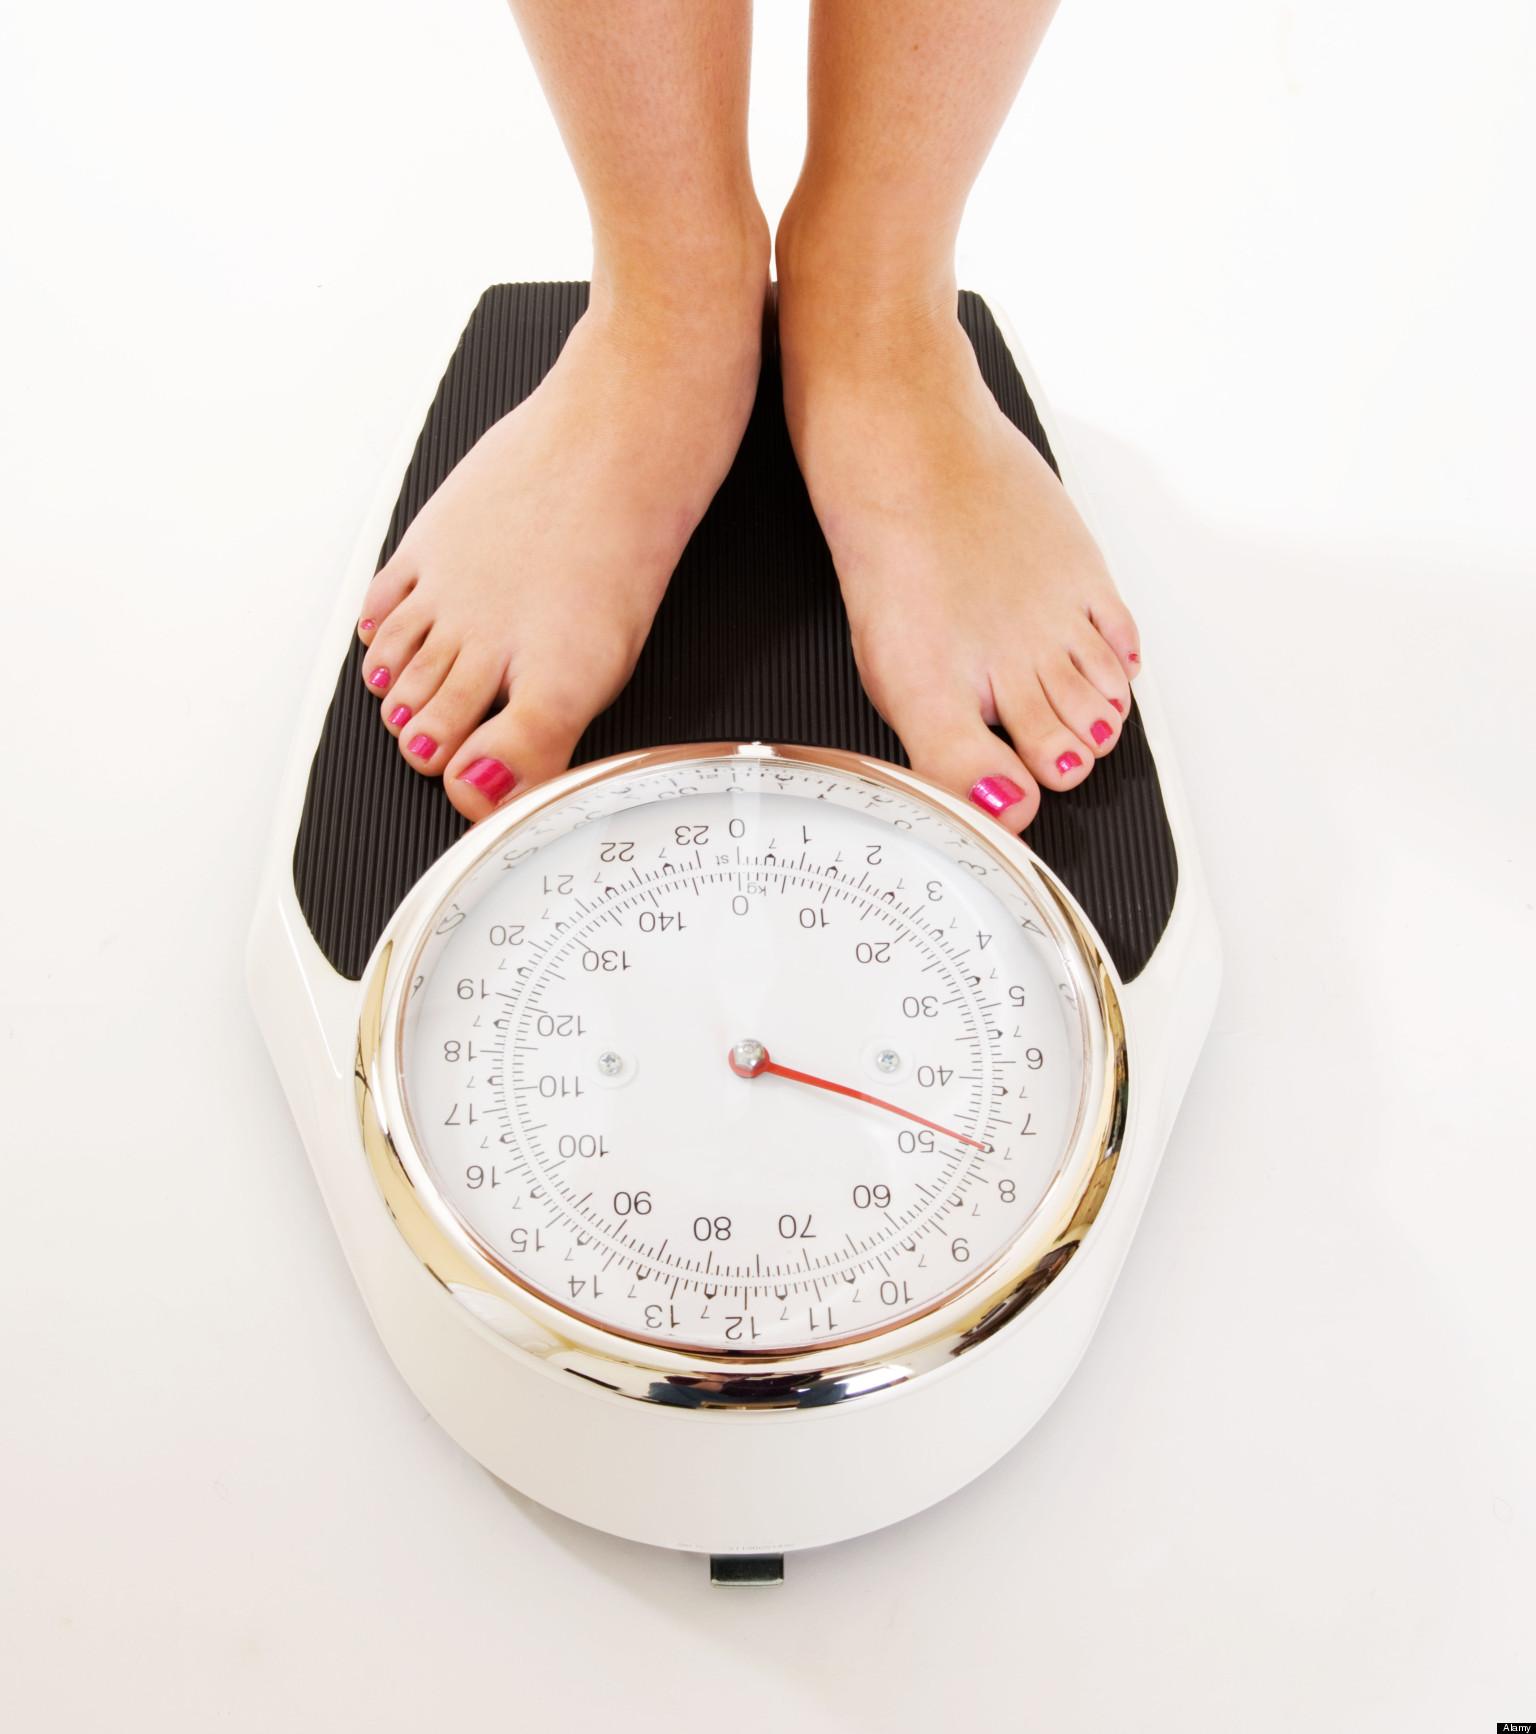 6 kilo afvallen in 10 dagen